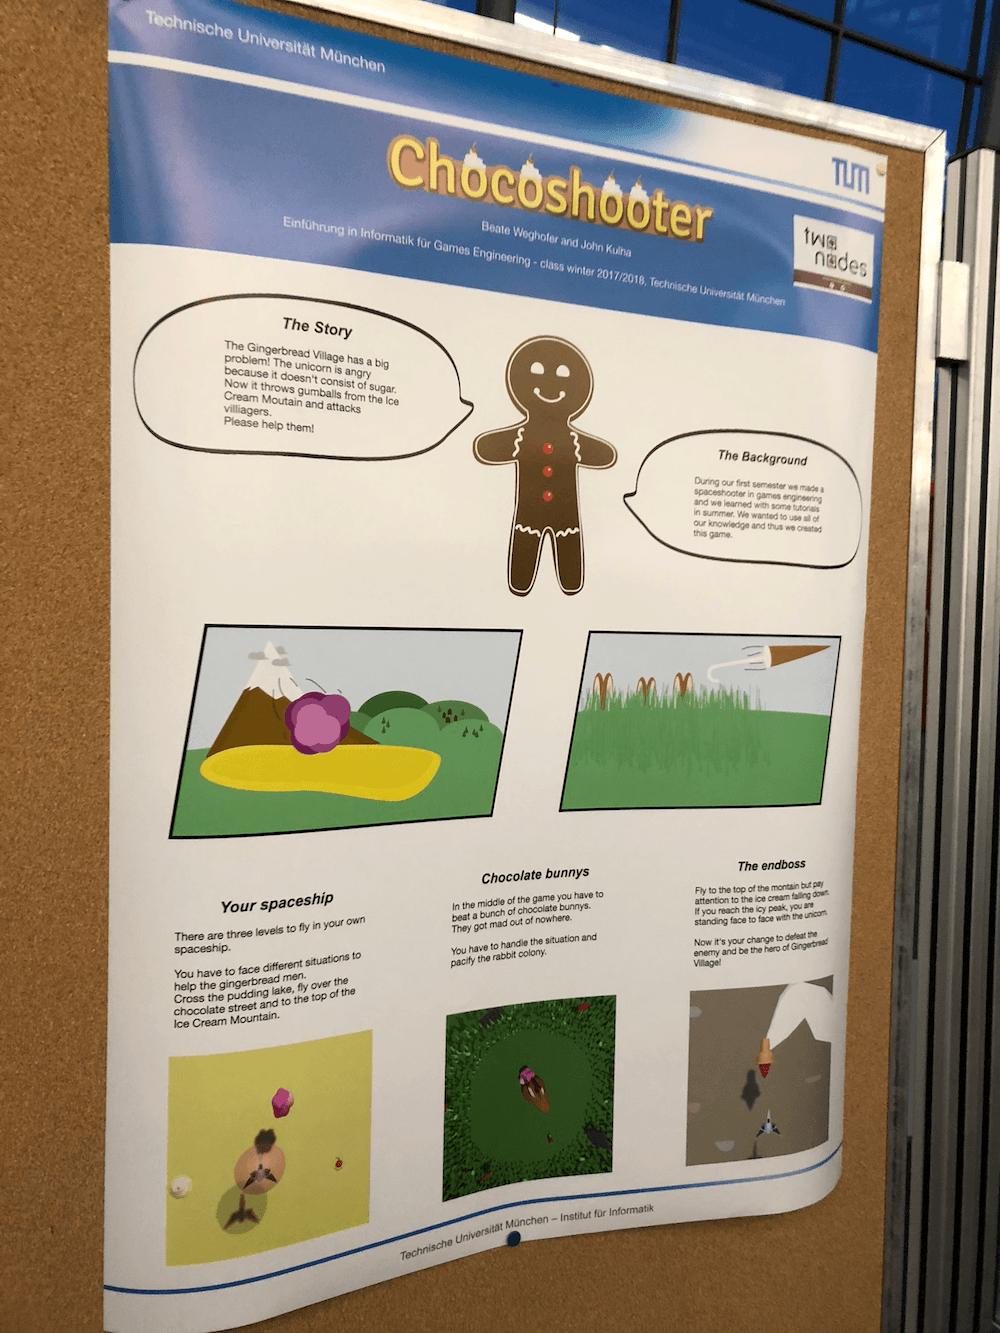 Chocoshooter poster